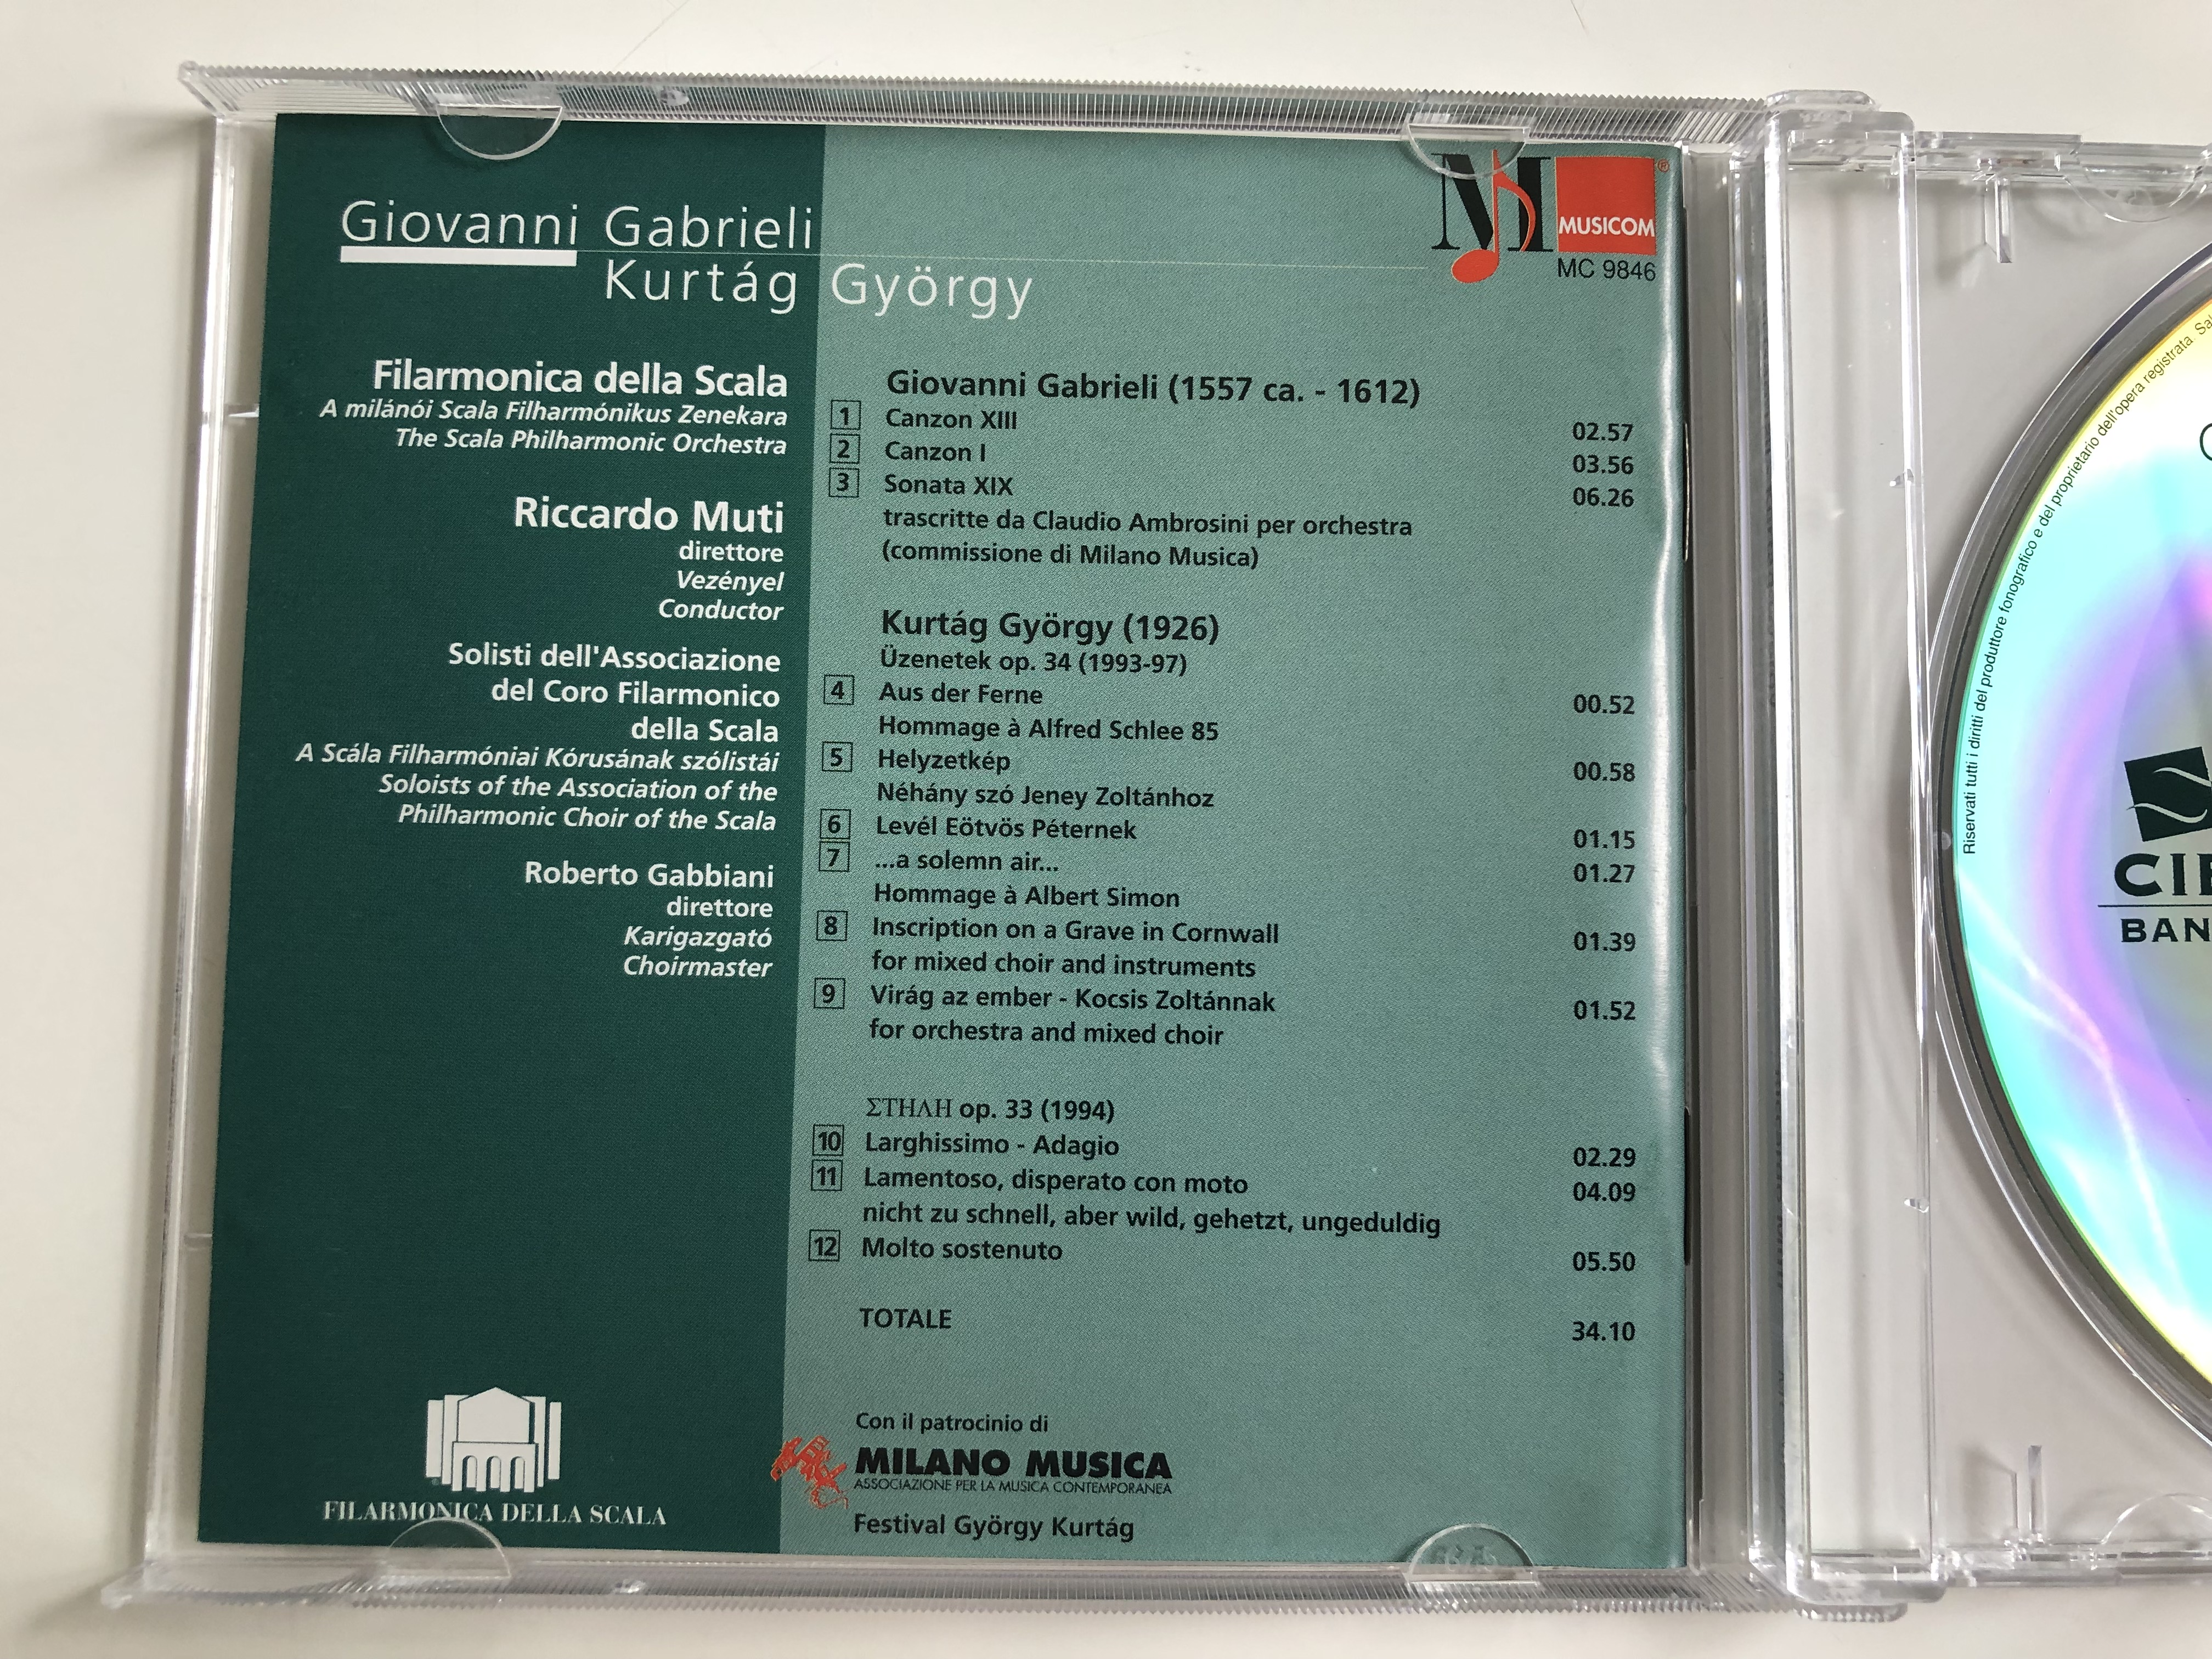 milano-musica-festival-gy-rgy-kurt-g-giovanni-gabrieli-kurt-g-gy-rgy-riccardo-muti-filarmonica-della-scala-musicom-audio-cd-1998-stereo-mc-9846-11-.jpg